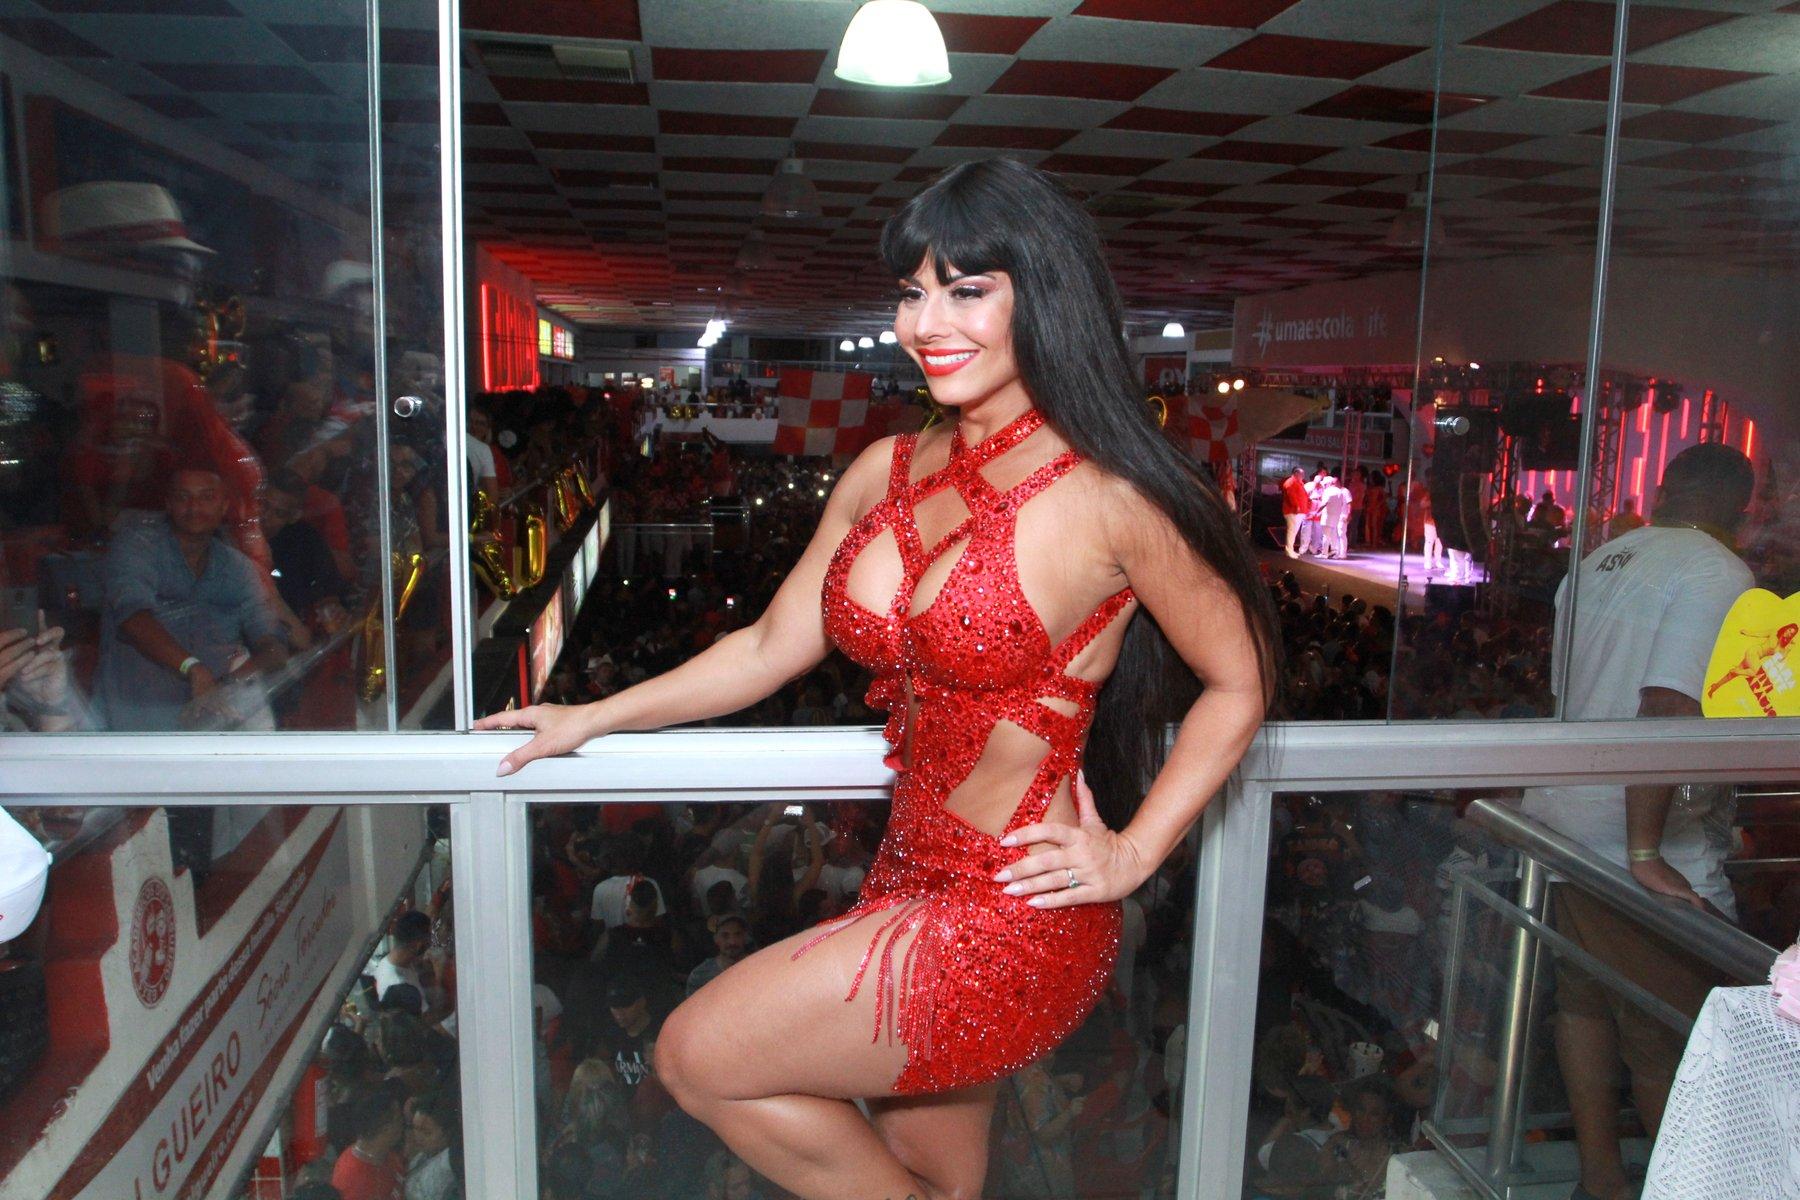 Viviane Araújo de peruca na Salgueiro (Foto: Thyago Andrade / BrazilNews)